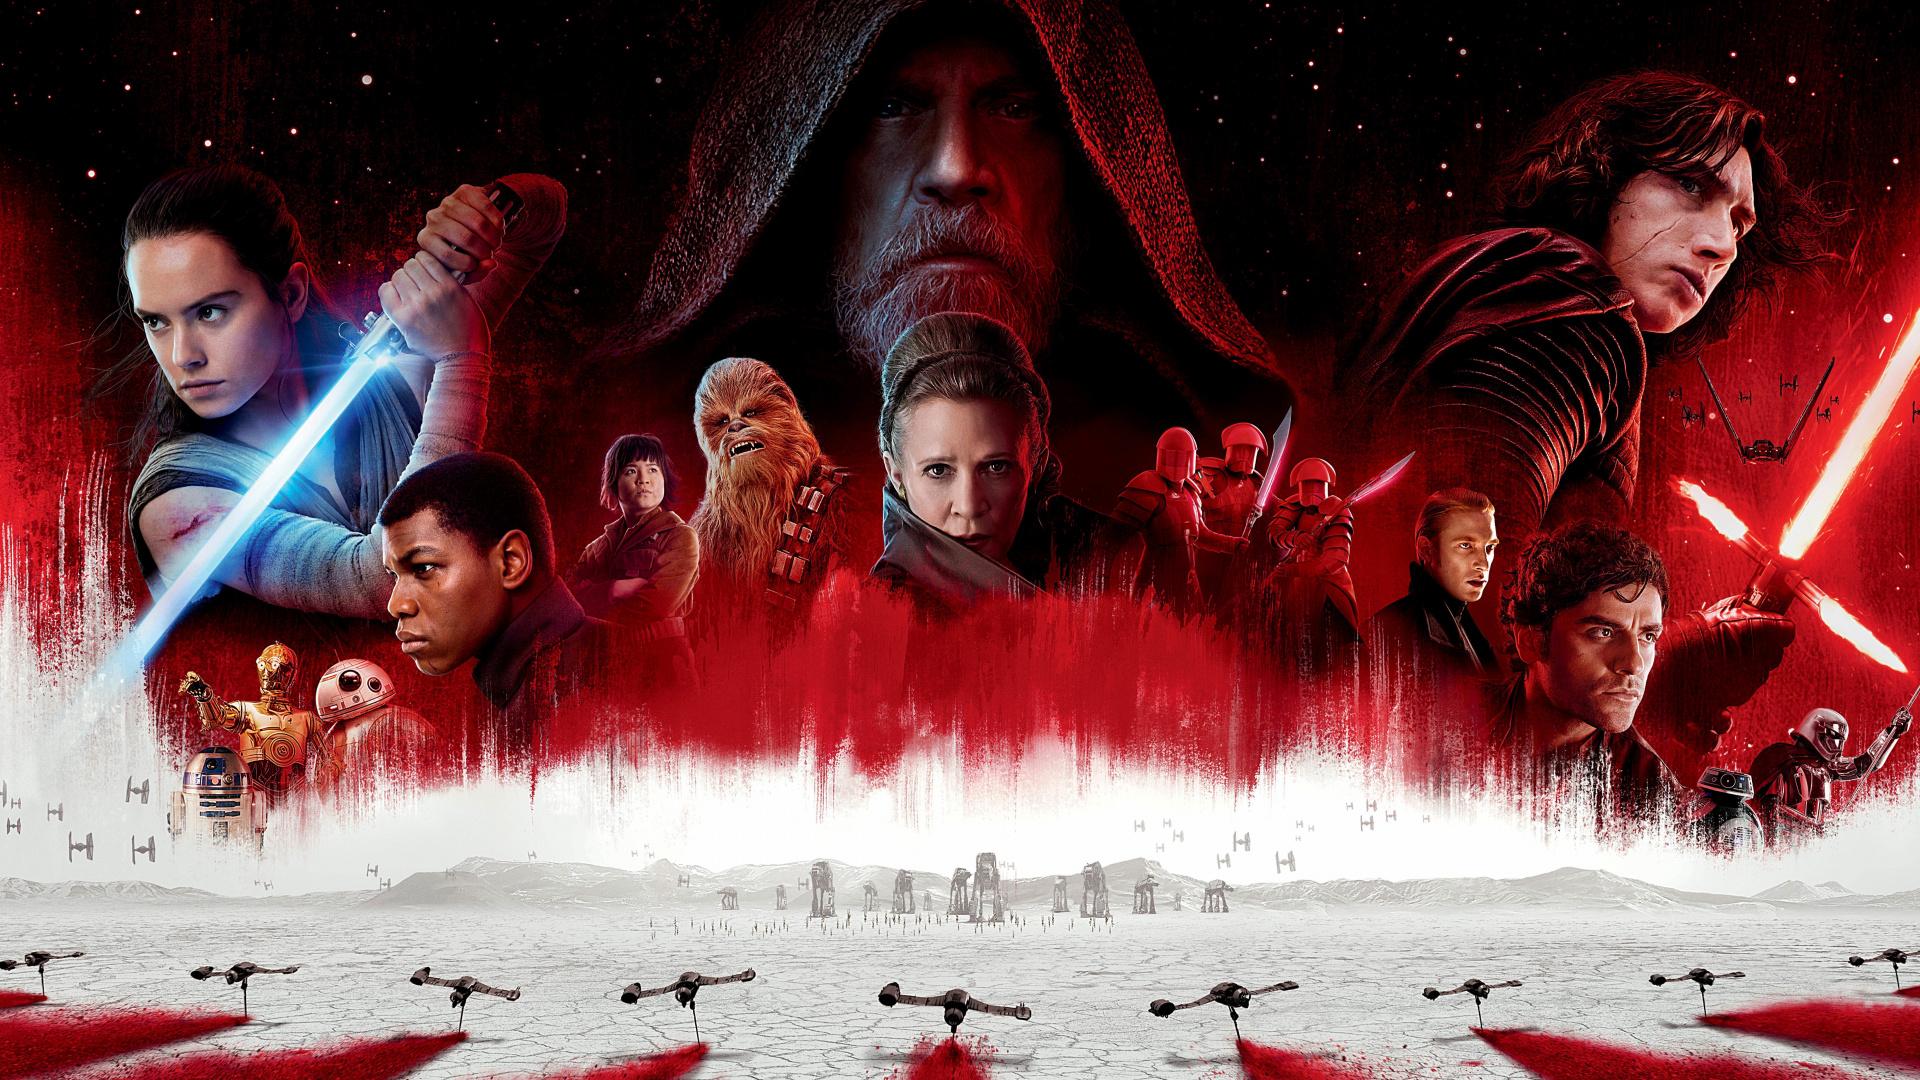 The Last Jedi Movie Poster 2017 Wallpaper Star Wars The Last Jedi 1920x1080 Wallpaper Teahub Io